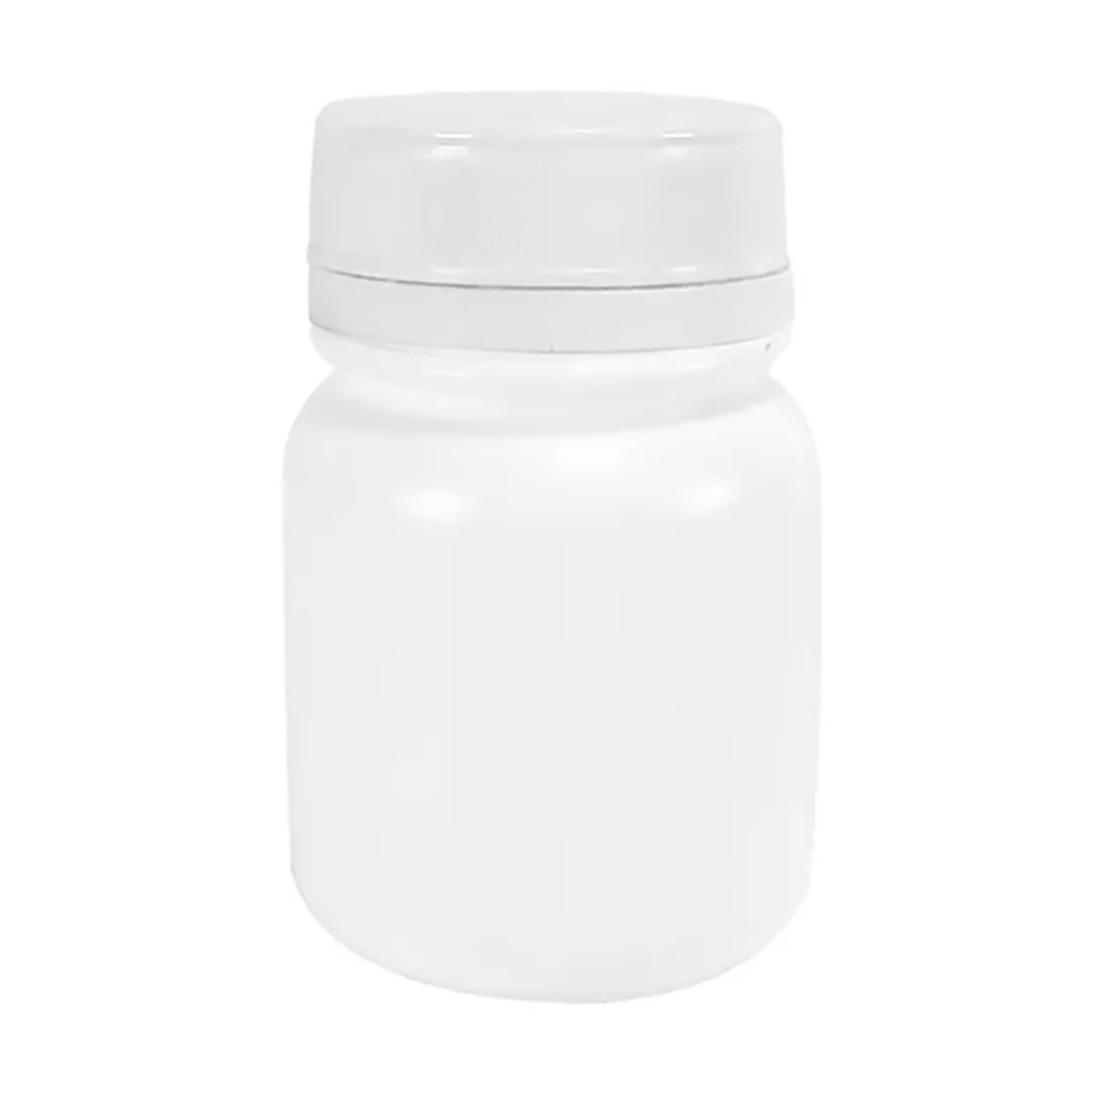 Pote Plástico para cápsula 90 ml Rosca Lacre kit com 50 unid